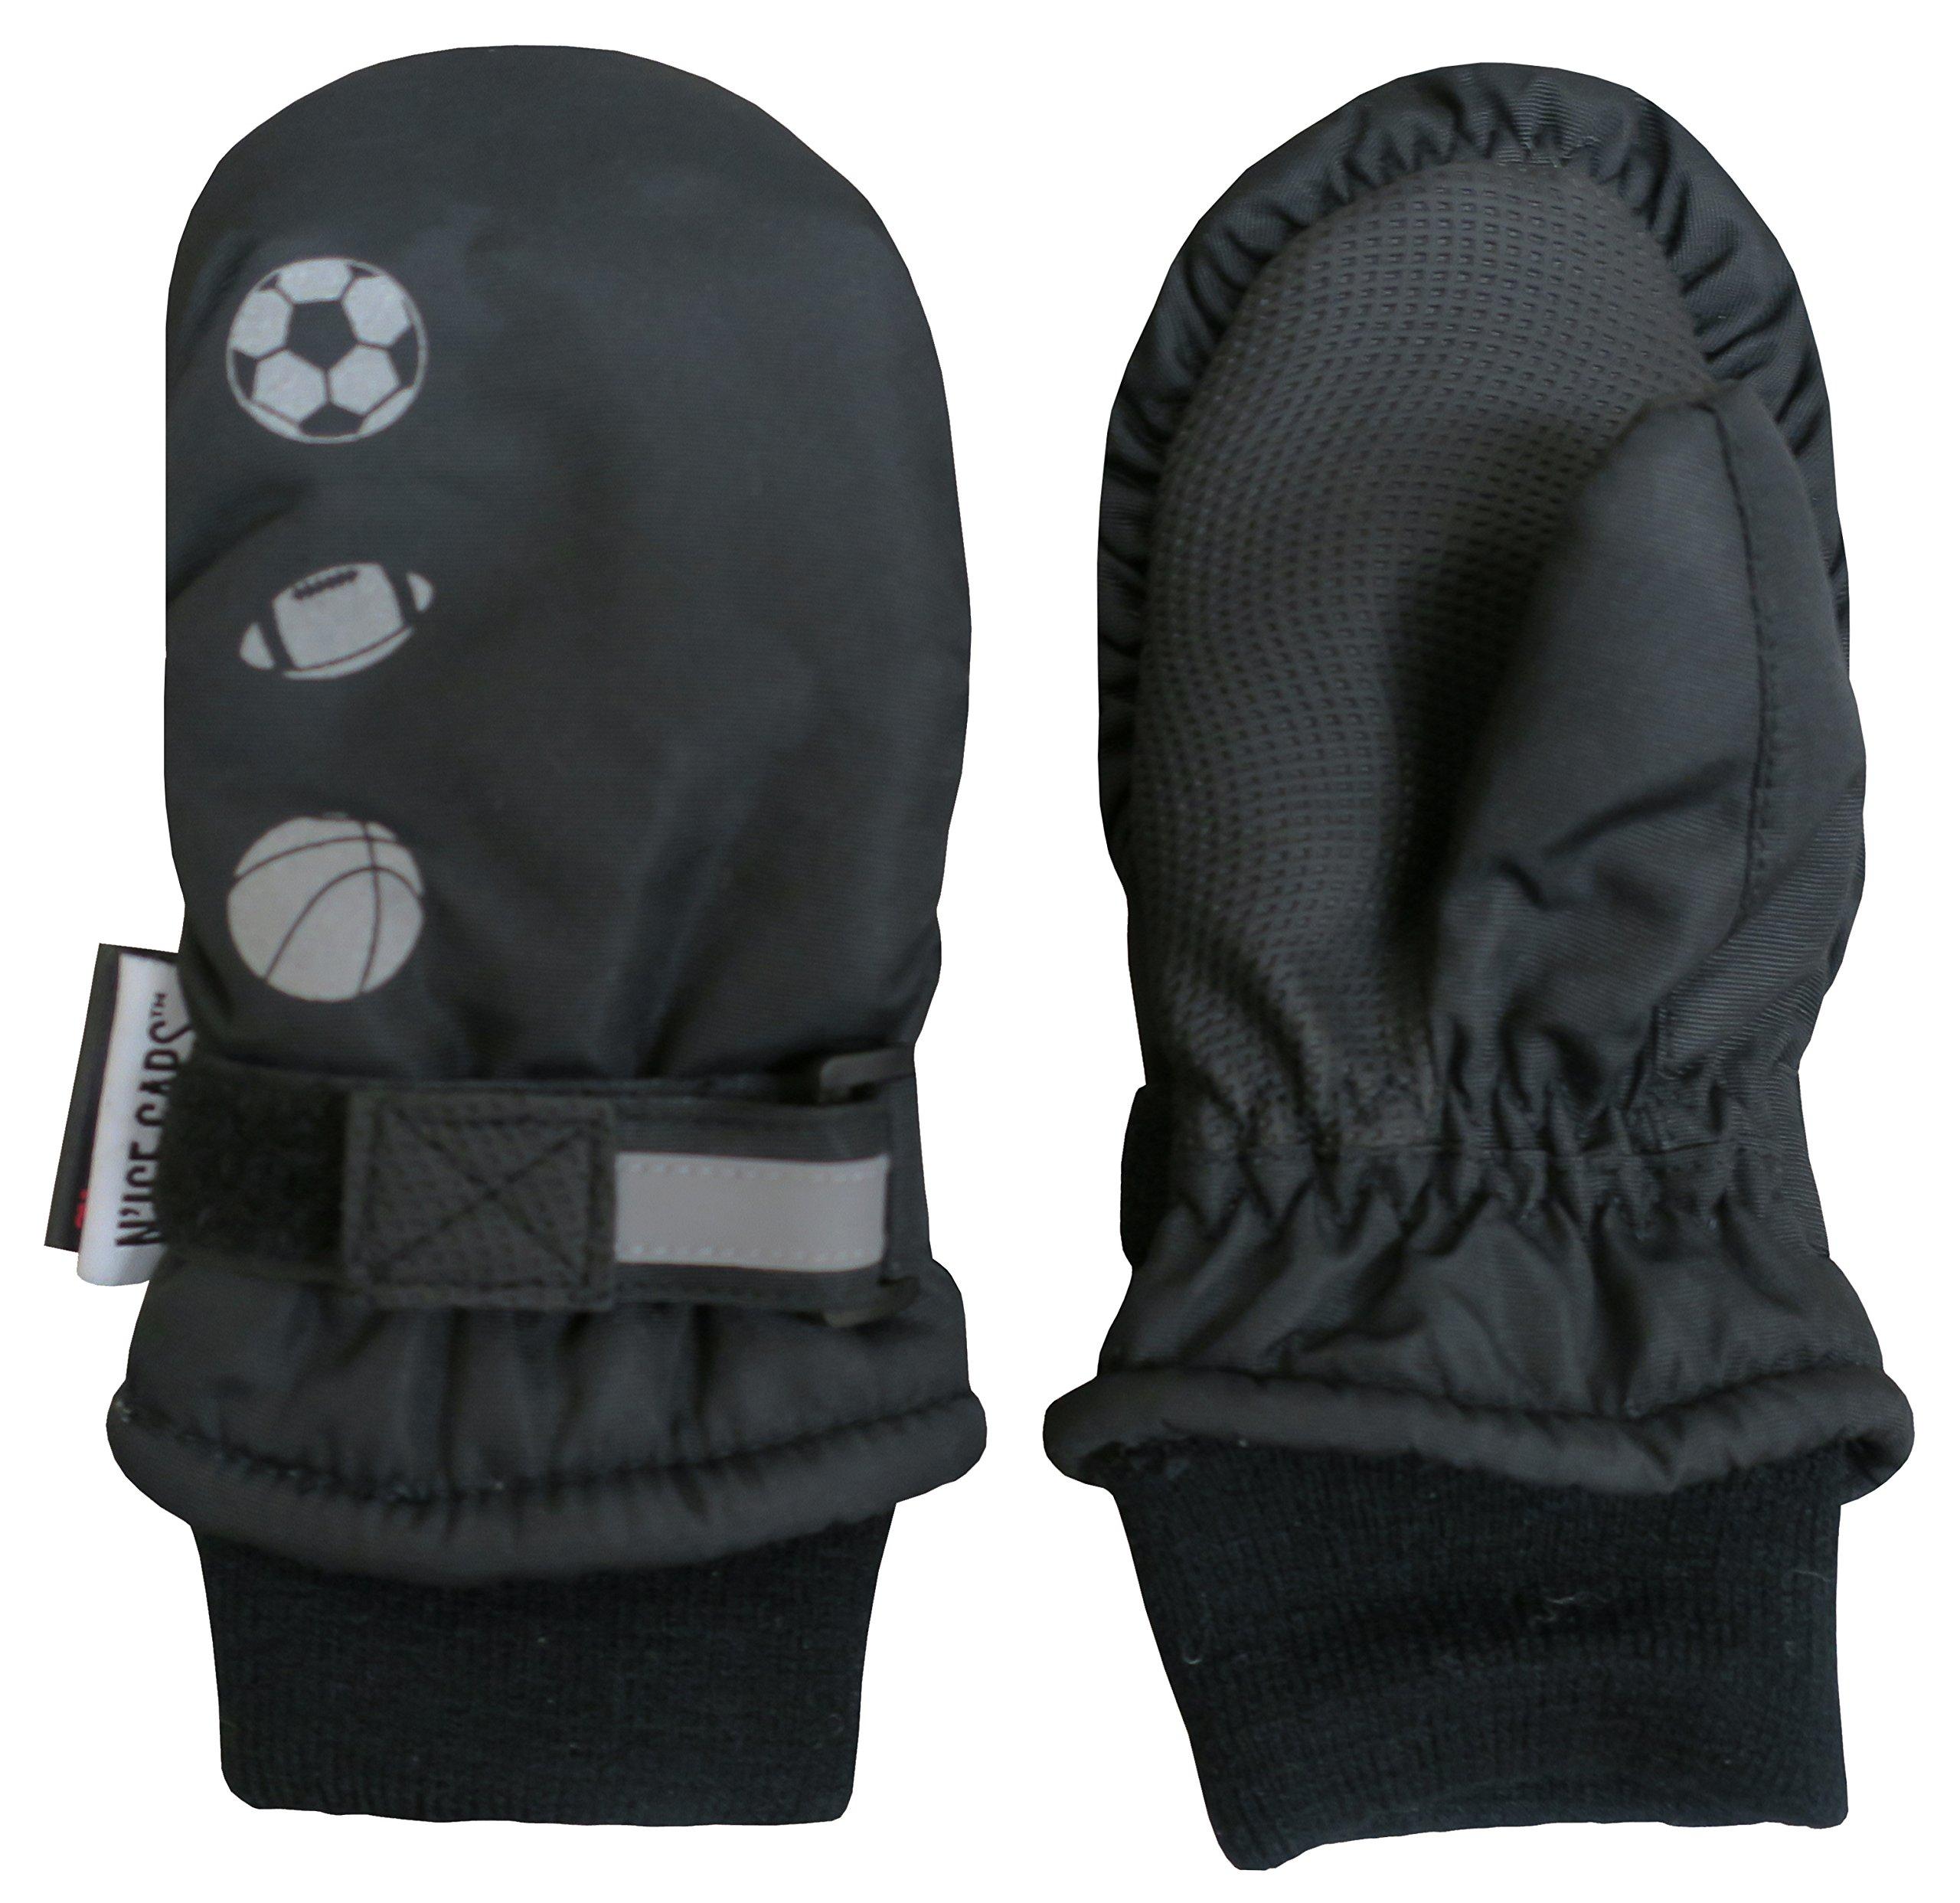 N'Ice Caps Kids Thinsulate Waterproof Reflector Winter Snow Ski Mittens (2-3 Years, Black/Reflector Sports Balls)